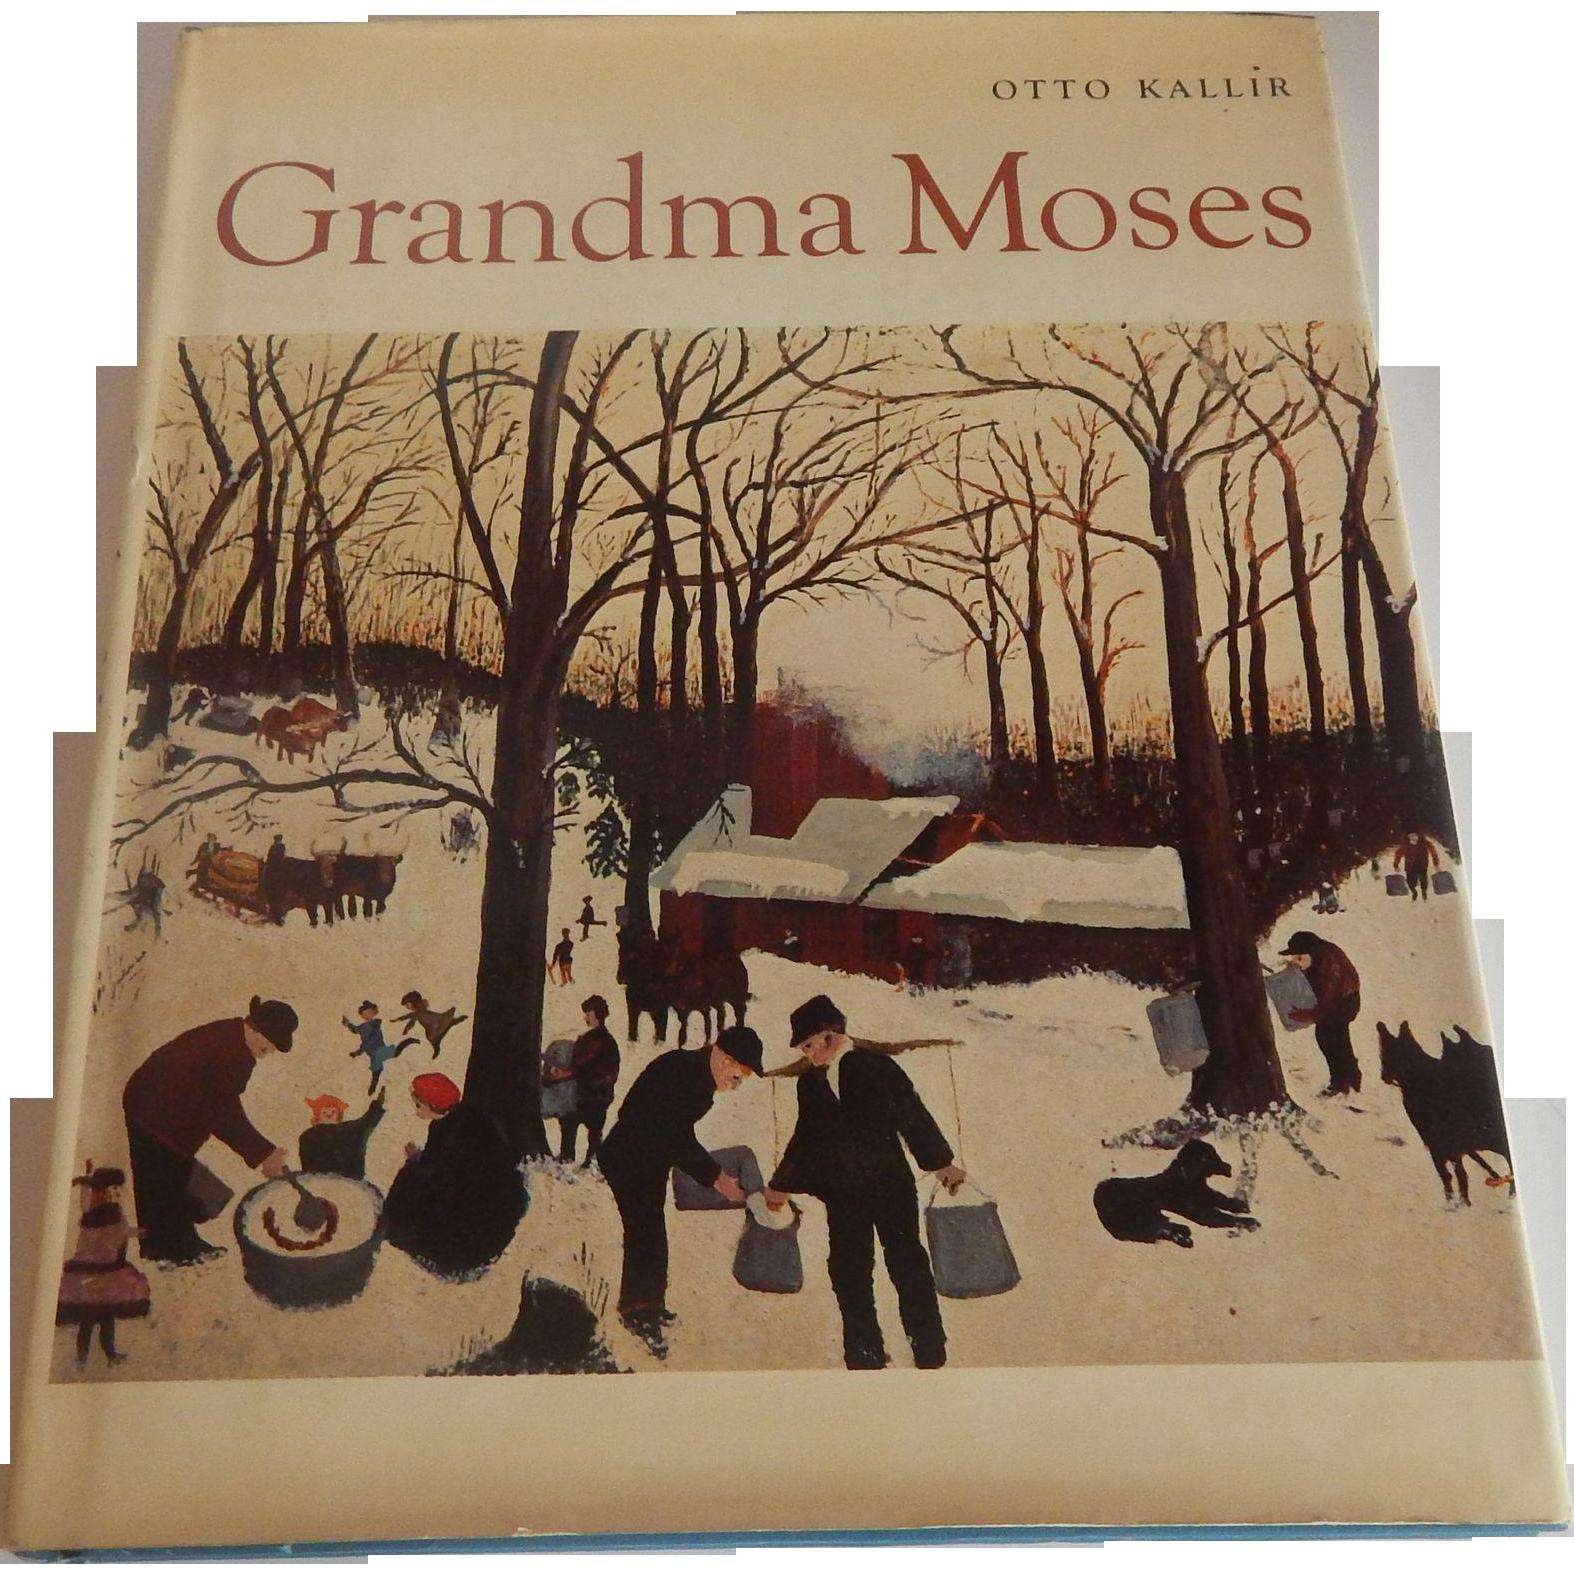 Gramdma Moses by Otto Kallir